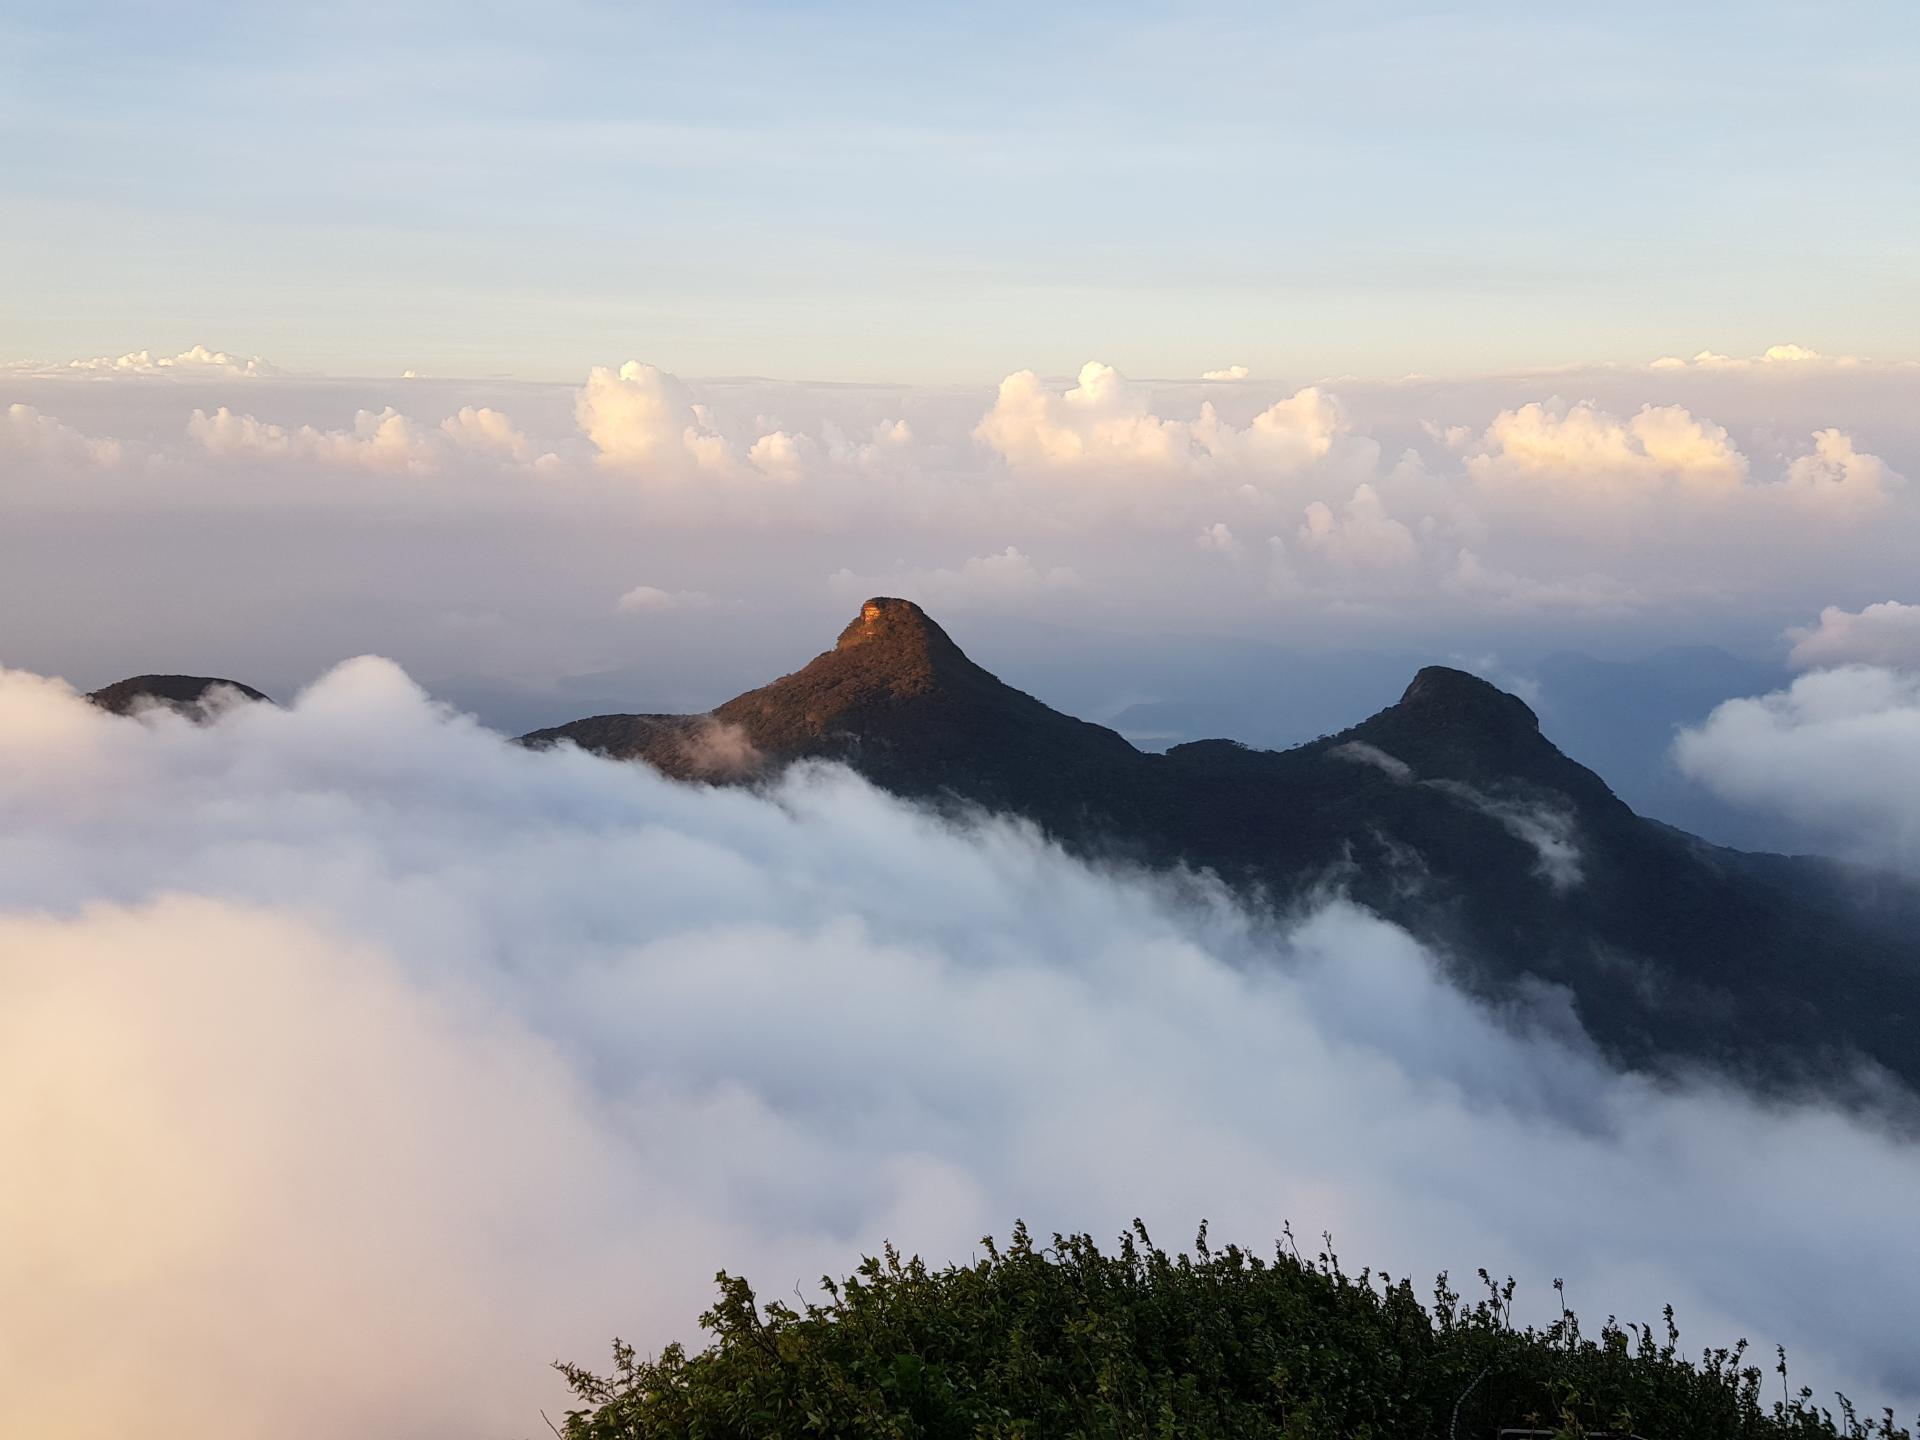 вид на соседние горы с пика Адама, Шри-Ланка